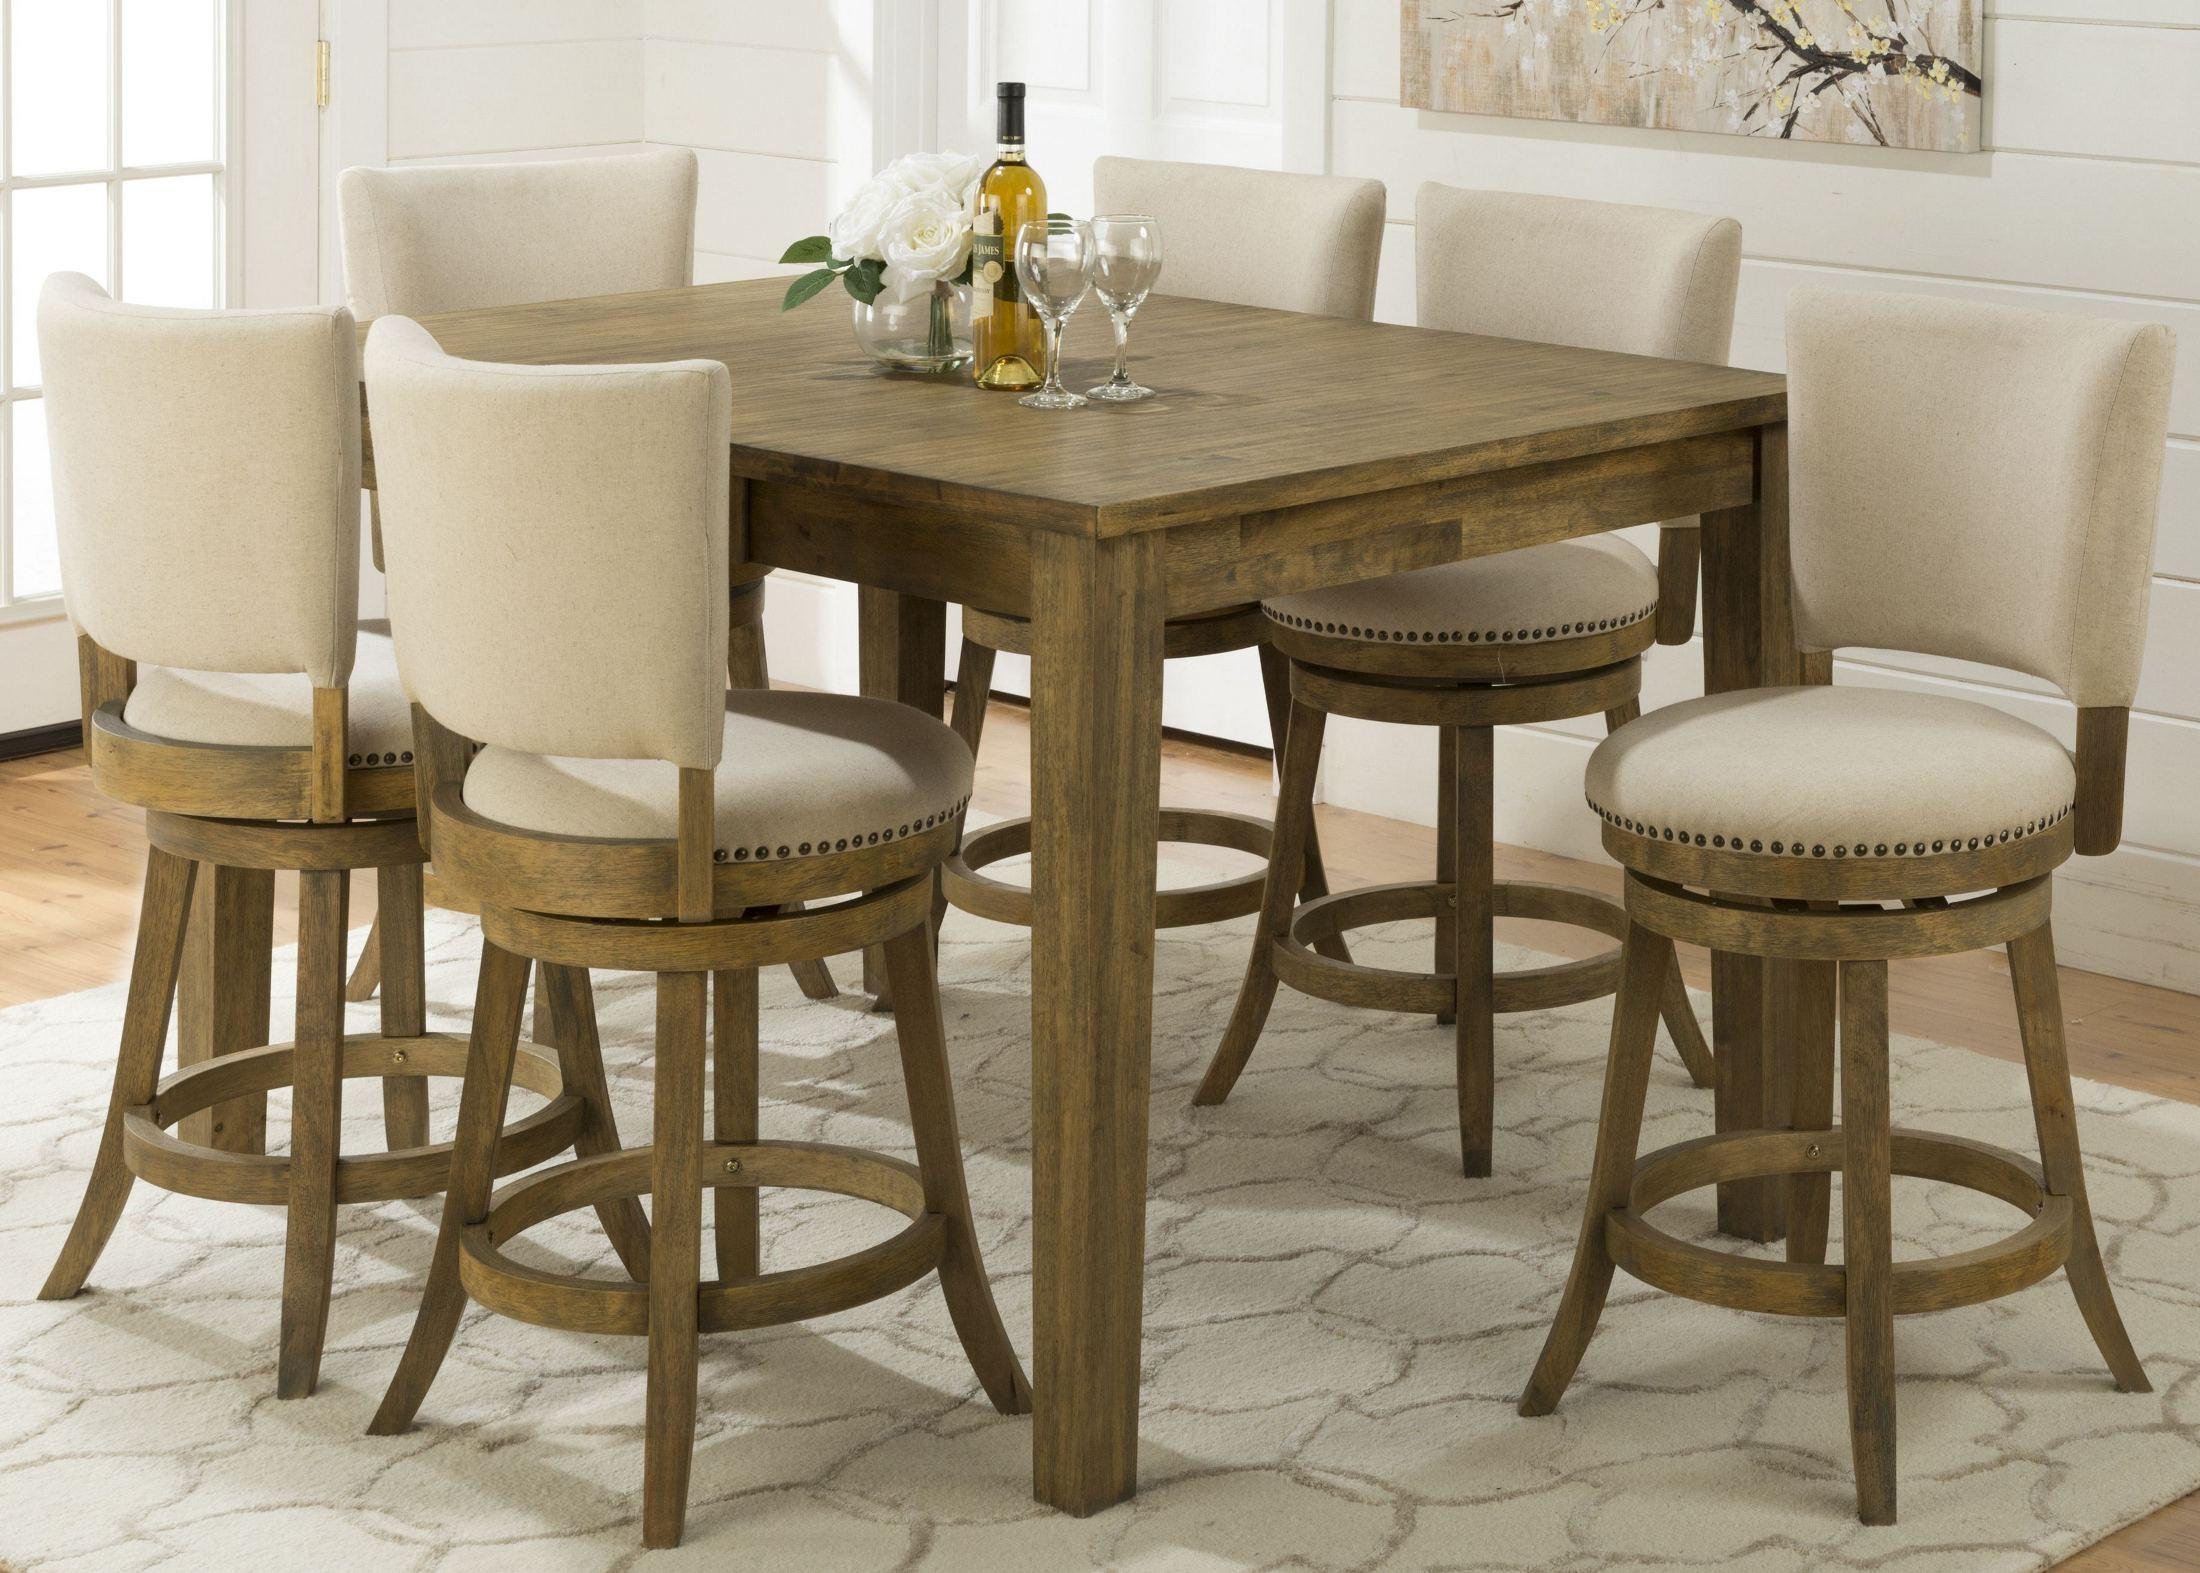 Turner 39 s landing extendable counter height dining table for Counter height extendable dining table